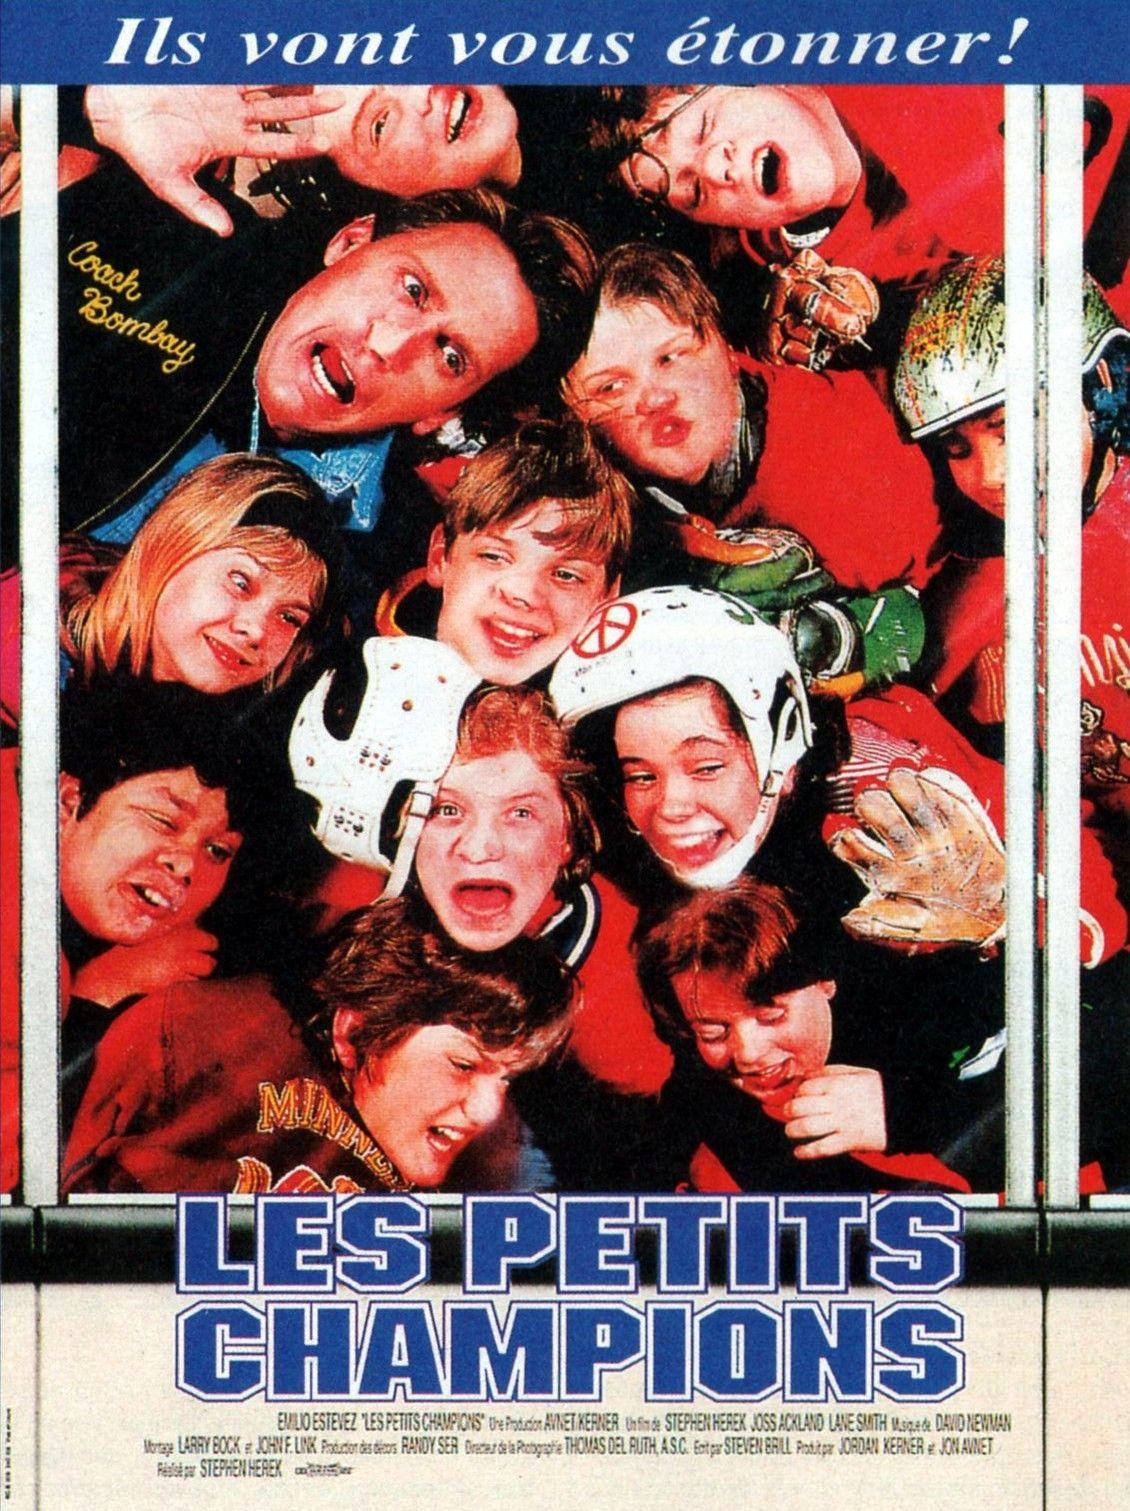 Les Petits Champions 2 Streaming : petits, champions, streaming, Petits, Champions, Mighty, Ducks], Stephen, Herek, Film,, Movie, Posters,, Movies